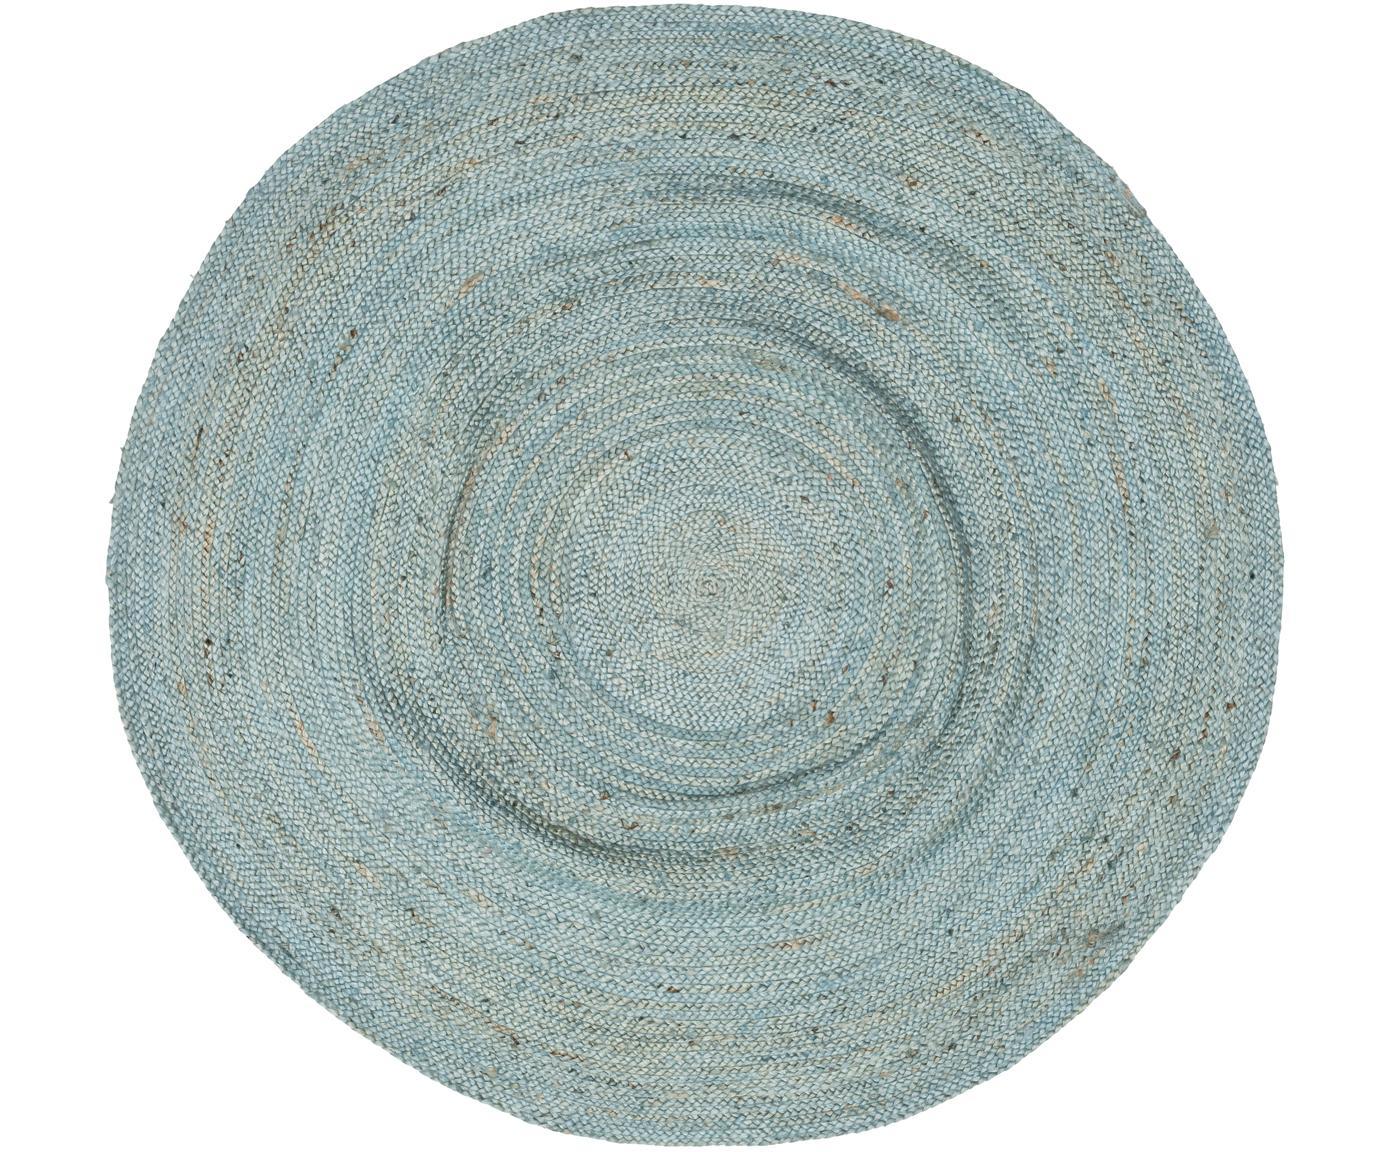 Alfombra redonda de yute Pampas, 100%yute, Azul claro, Ø 150  (Tamaño M)